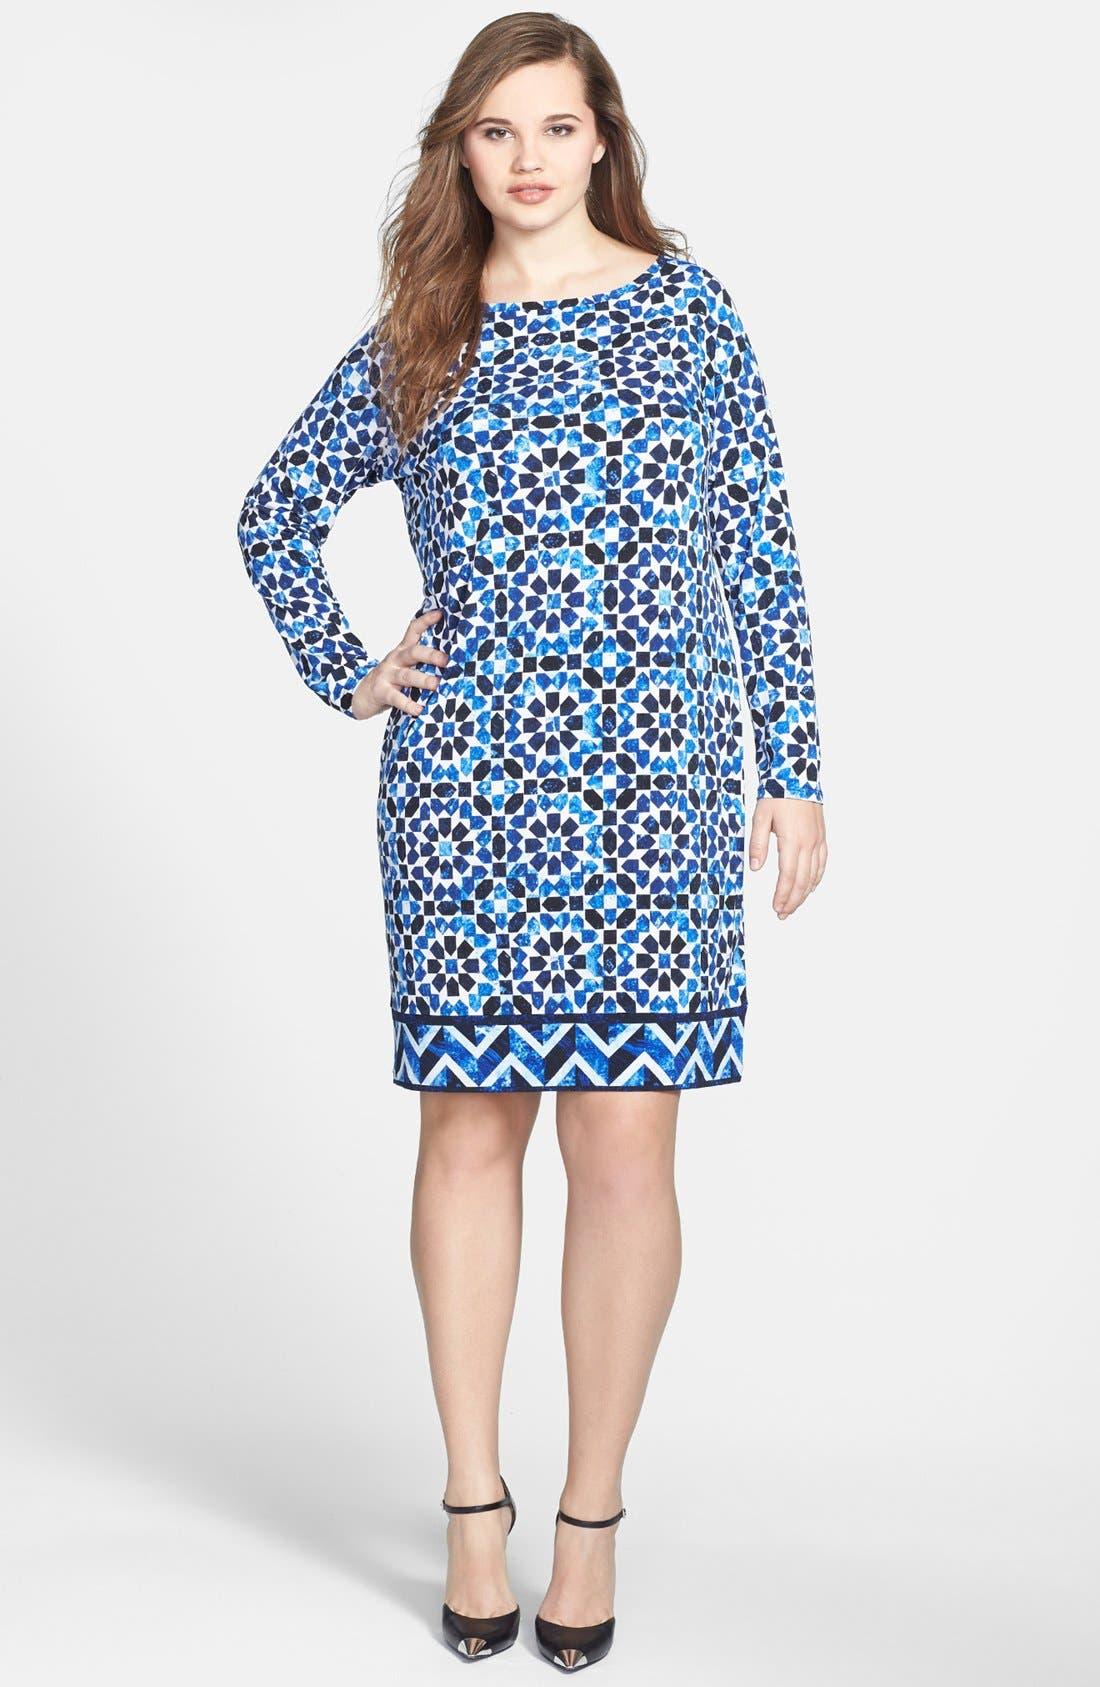 Alternate Image 1 Selected - MICHAEL Michael Kors Print Jersey Sheath Dress (Plus Size)